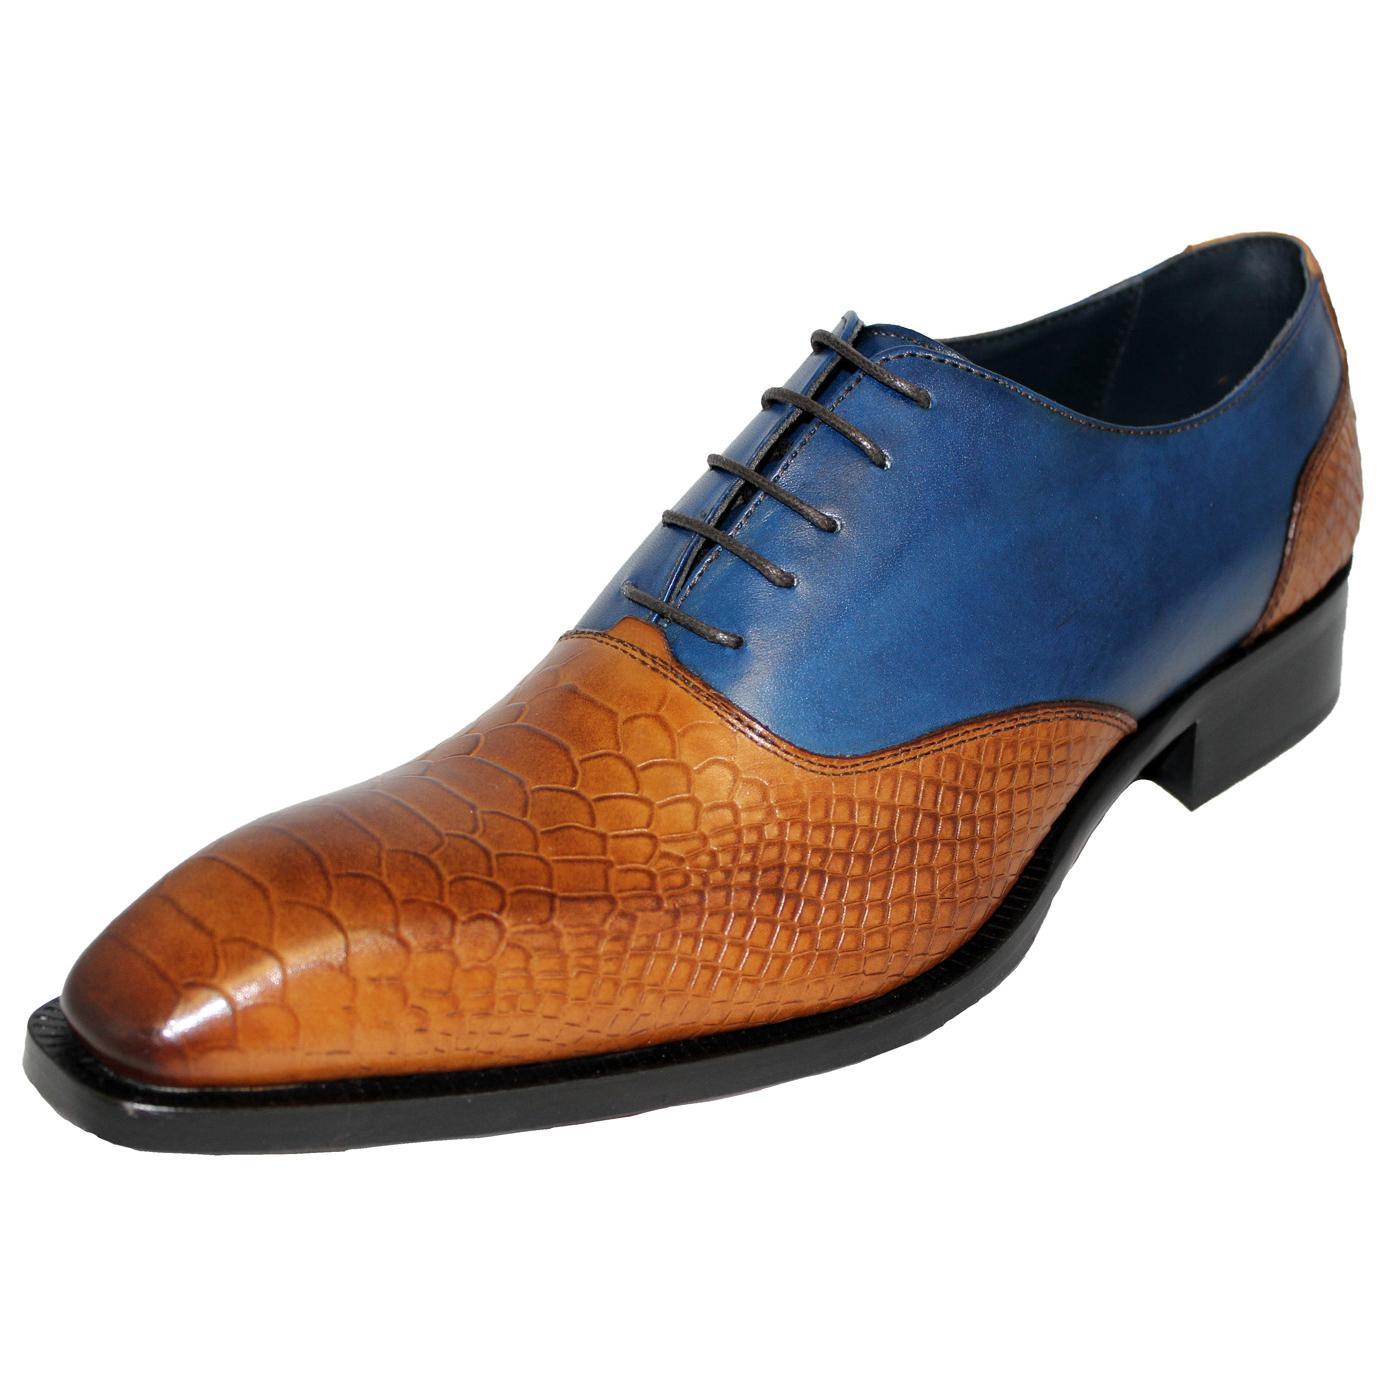 Duca Di Matiste Royal Blue Croc Print Driver Loafer Shoes